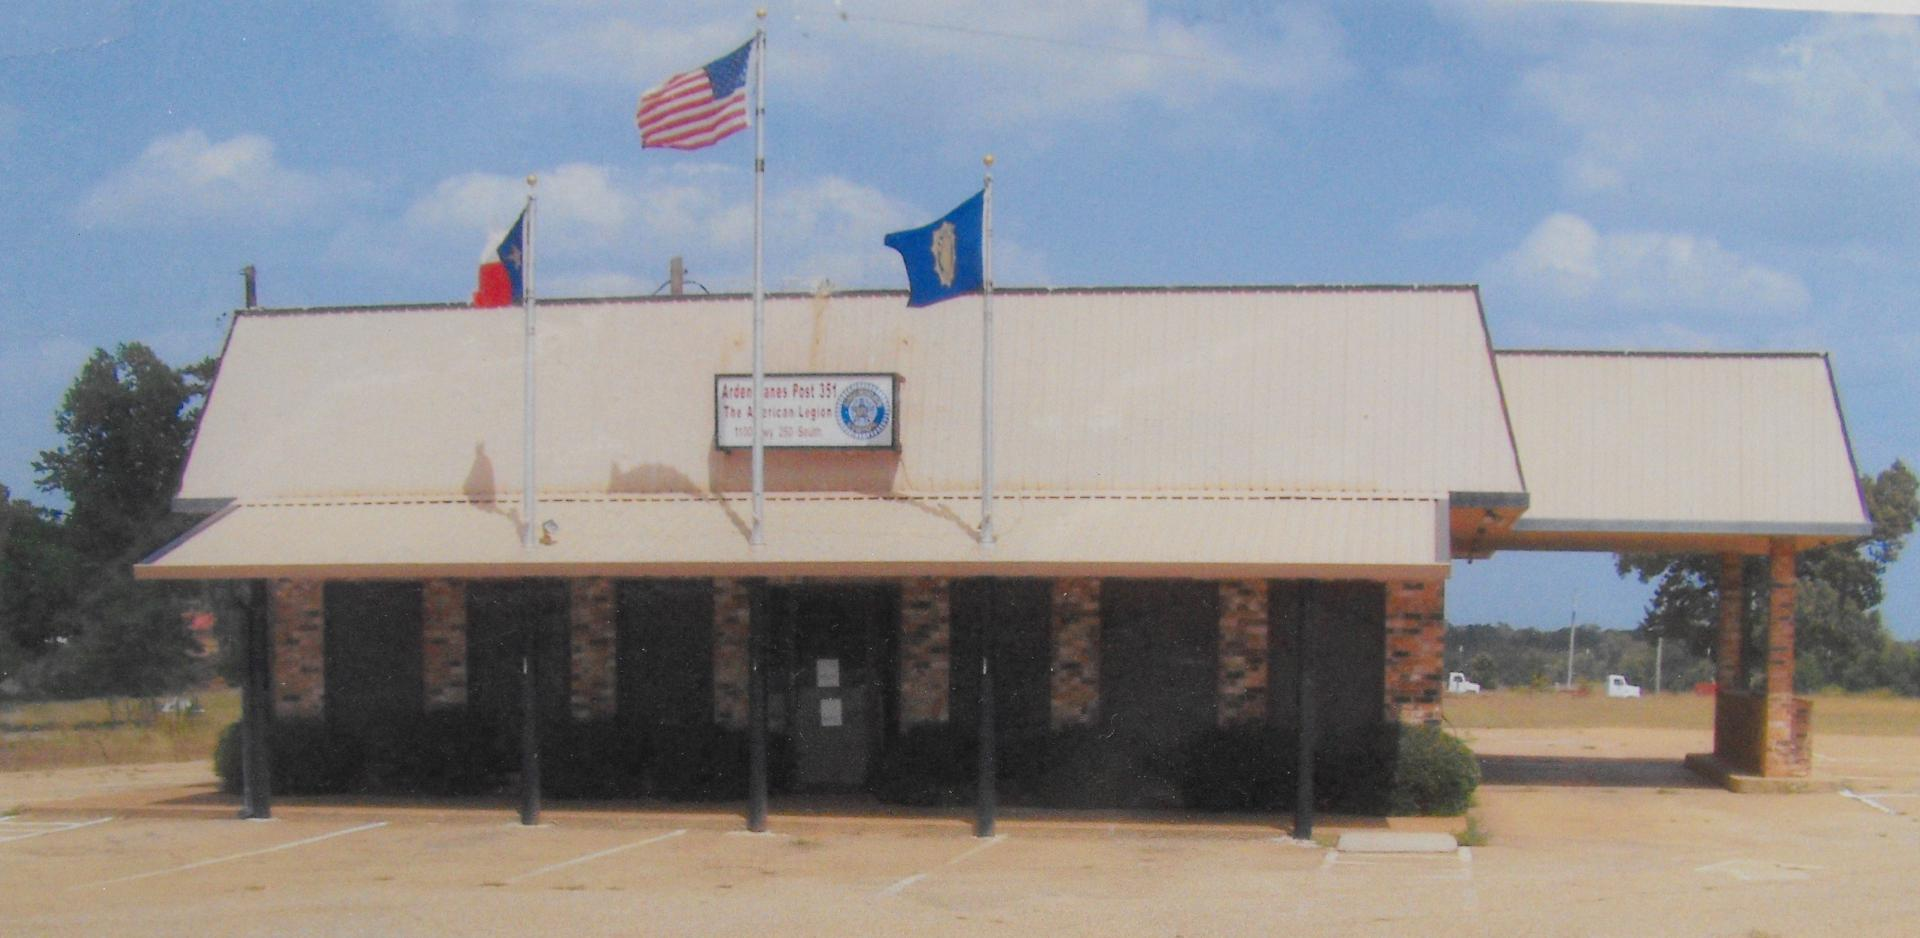 Post 351 Hughes Springs, Texas